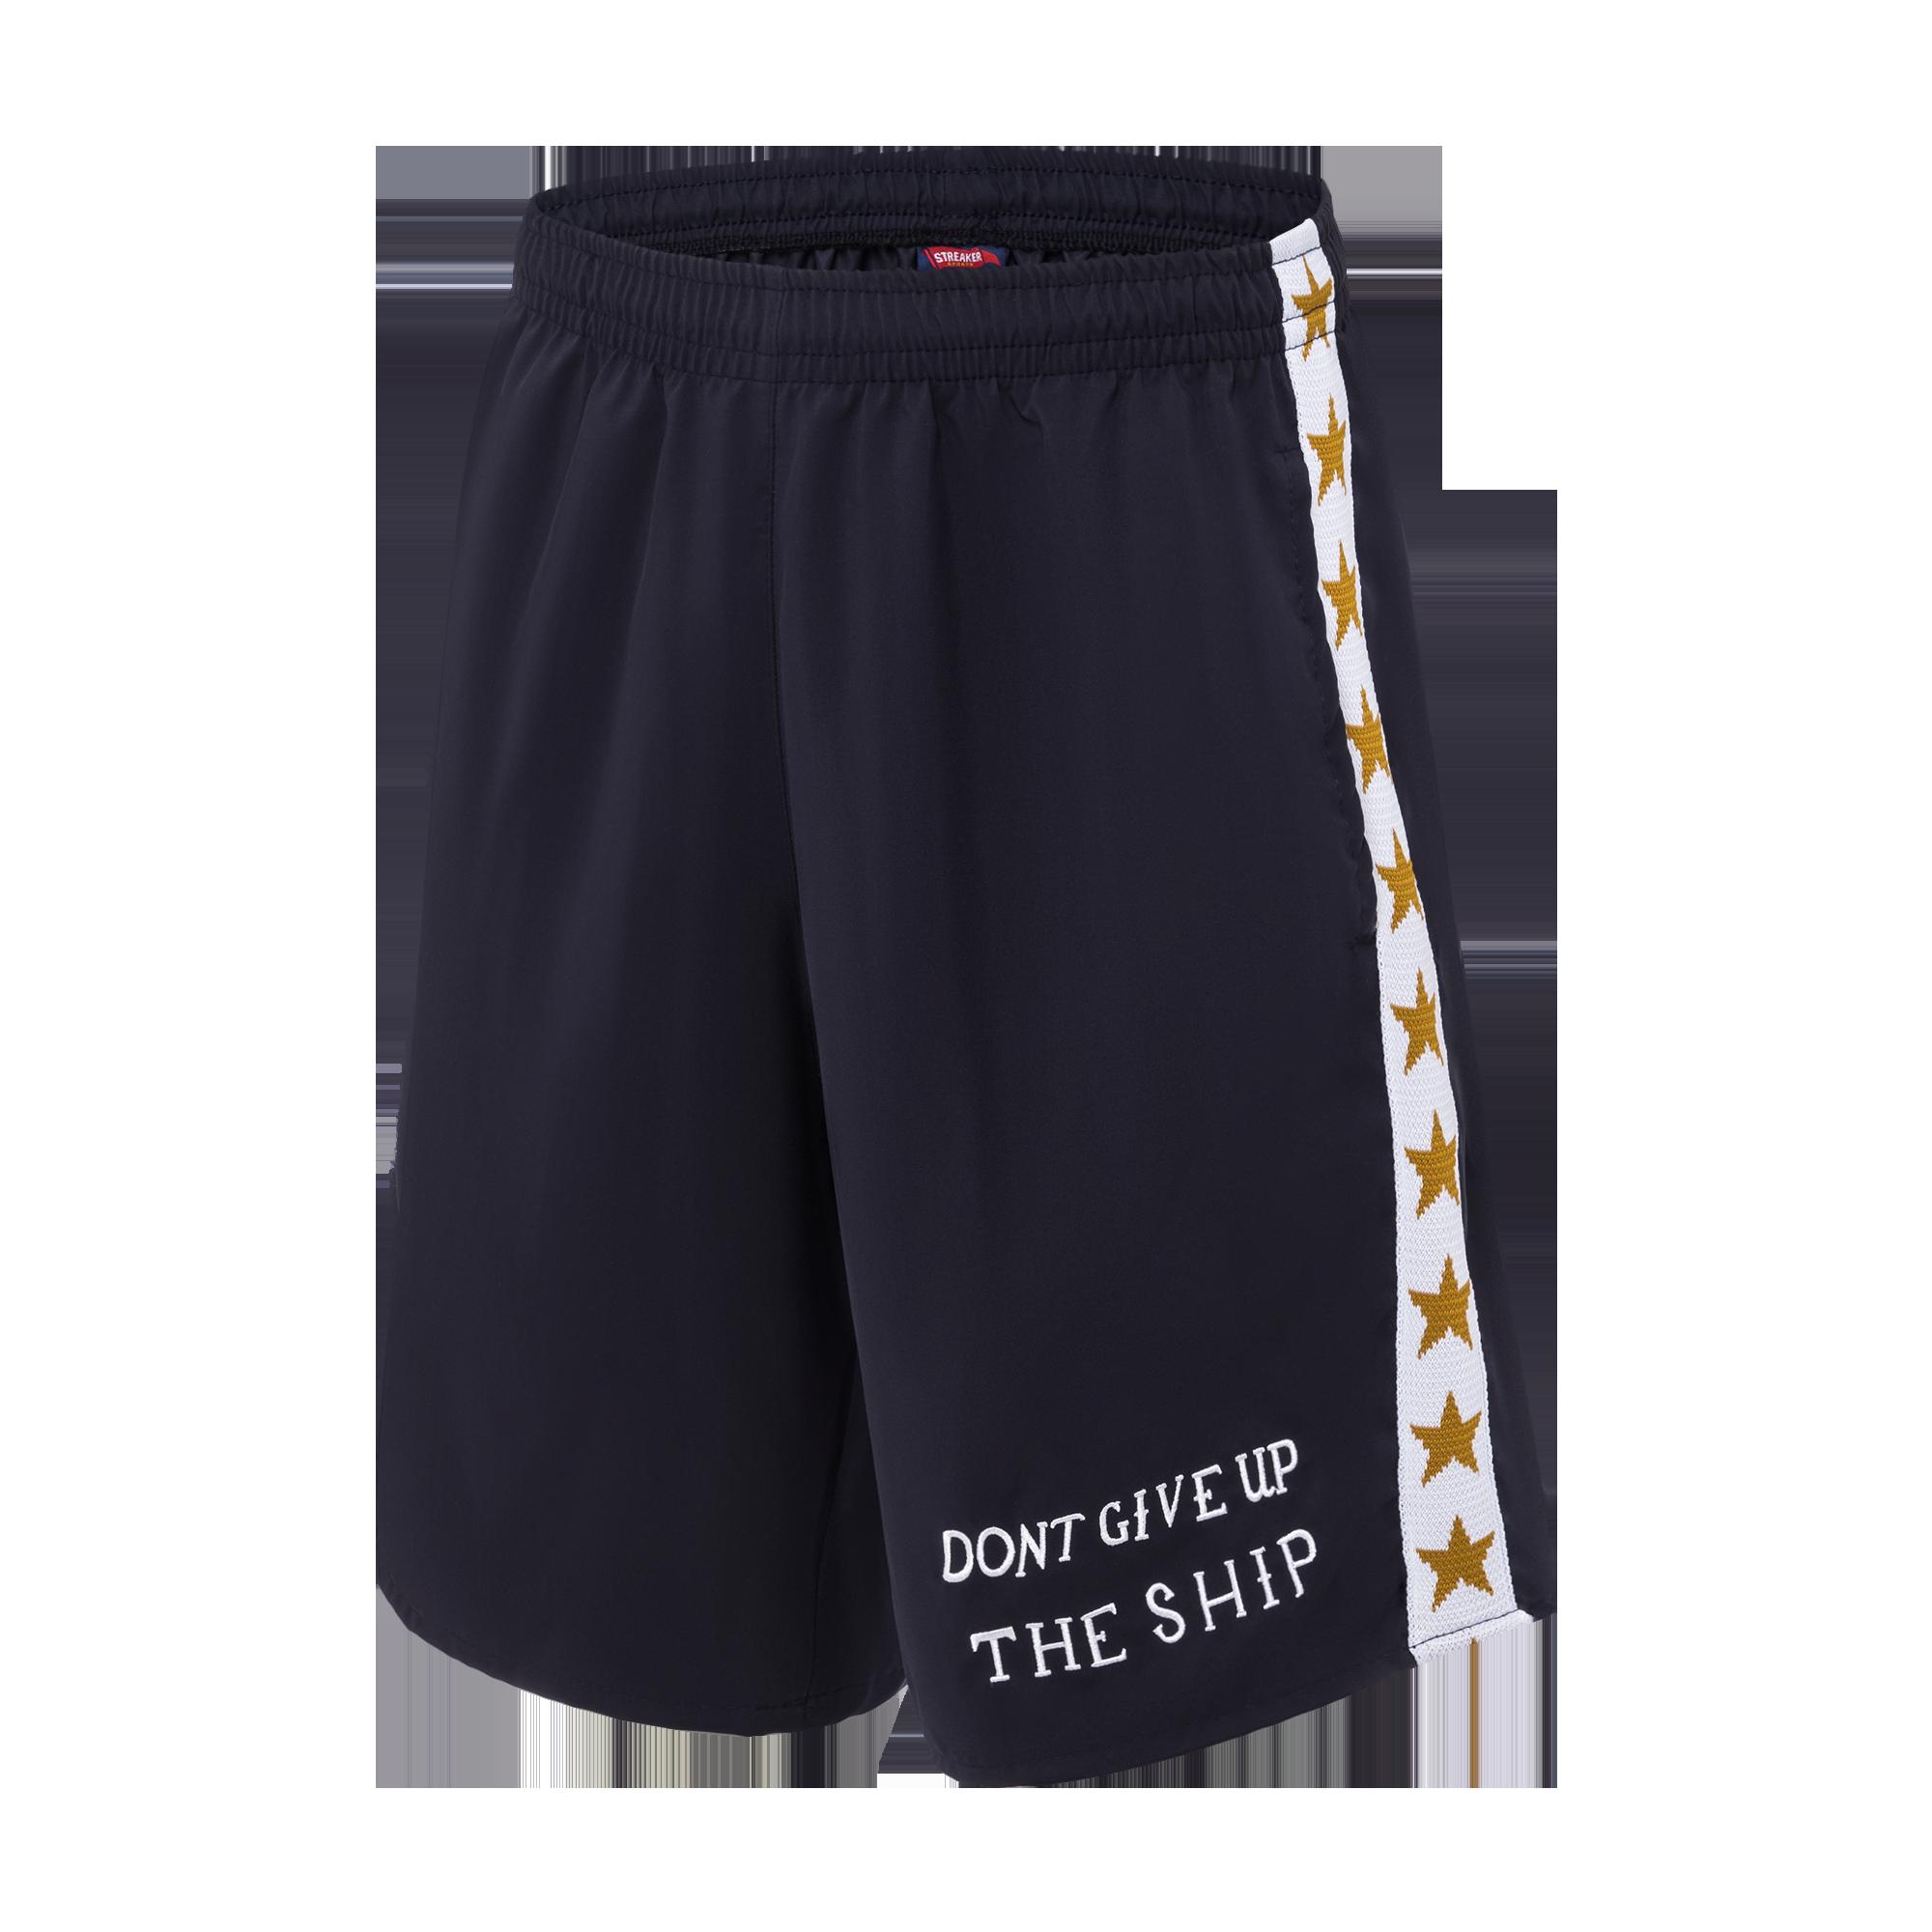 black Shorts product photography